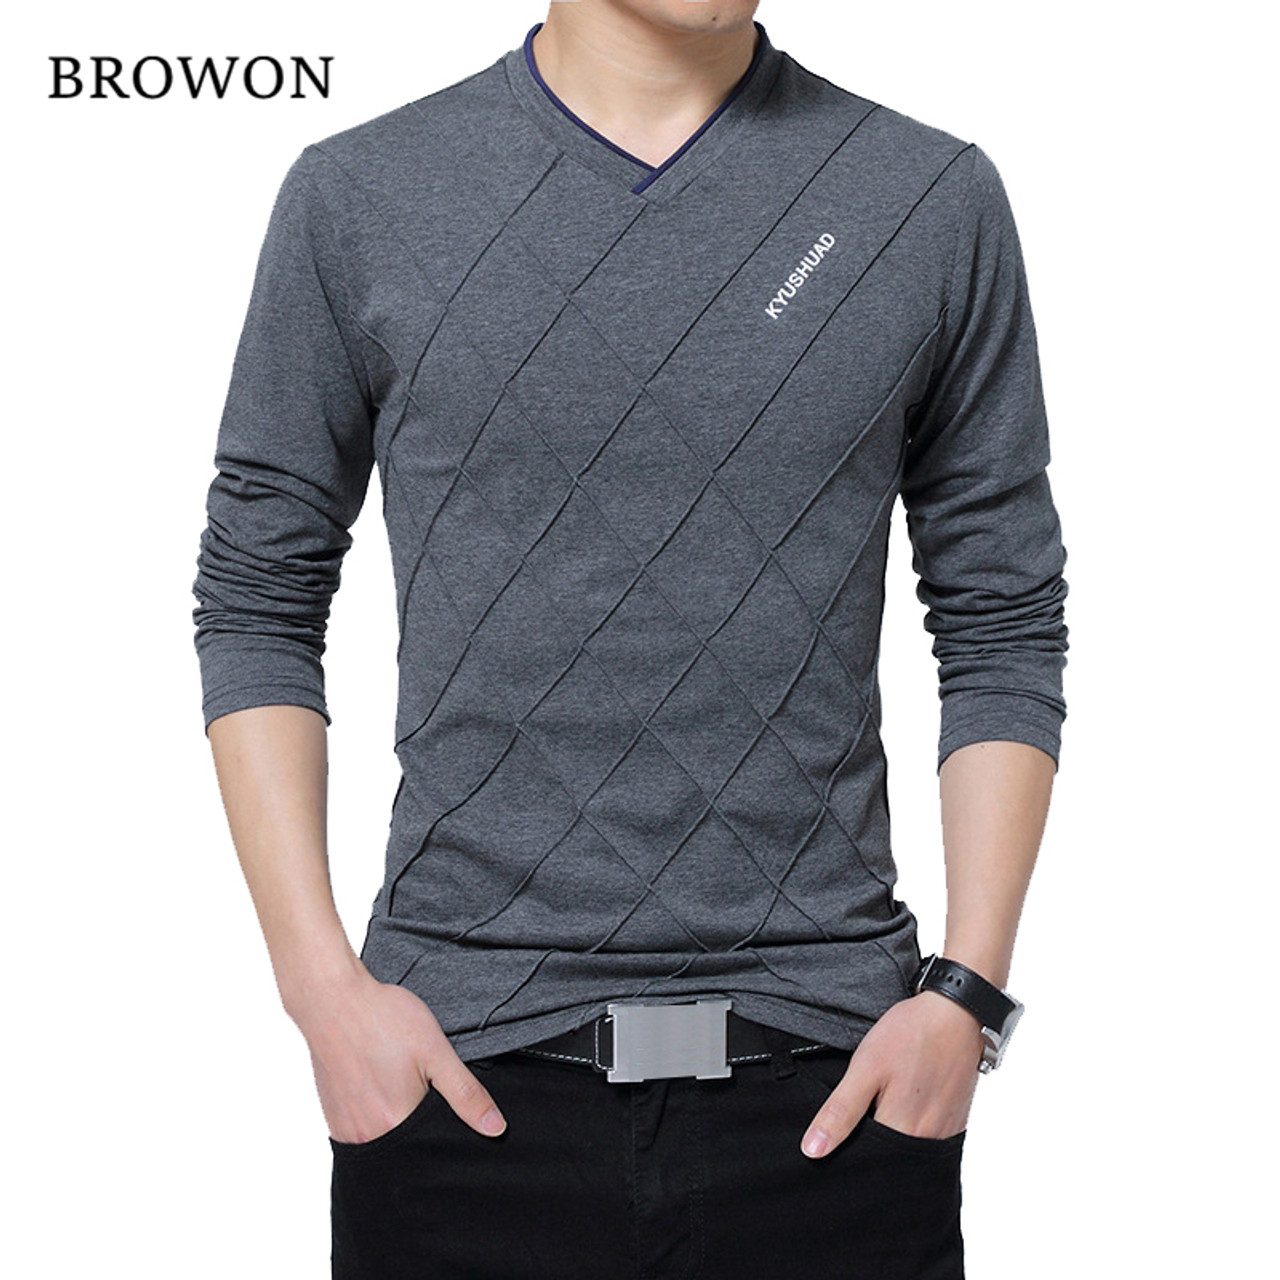 BROWON 2018 Fashion Men T-shirt Slim Fit Custom T-shirt